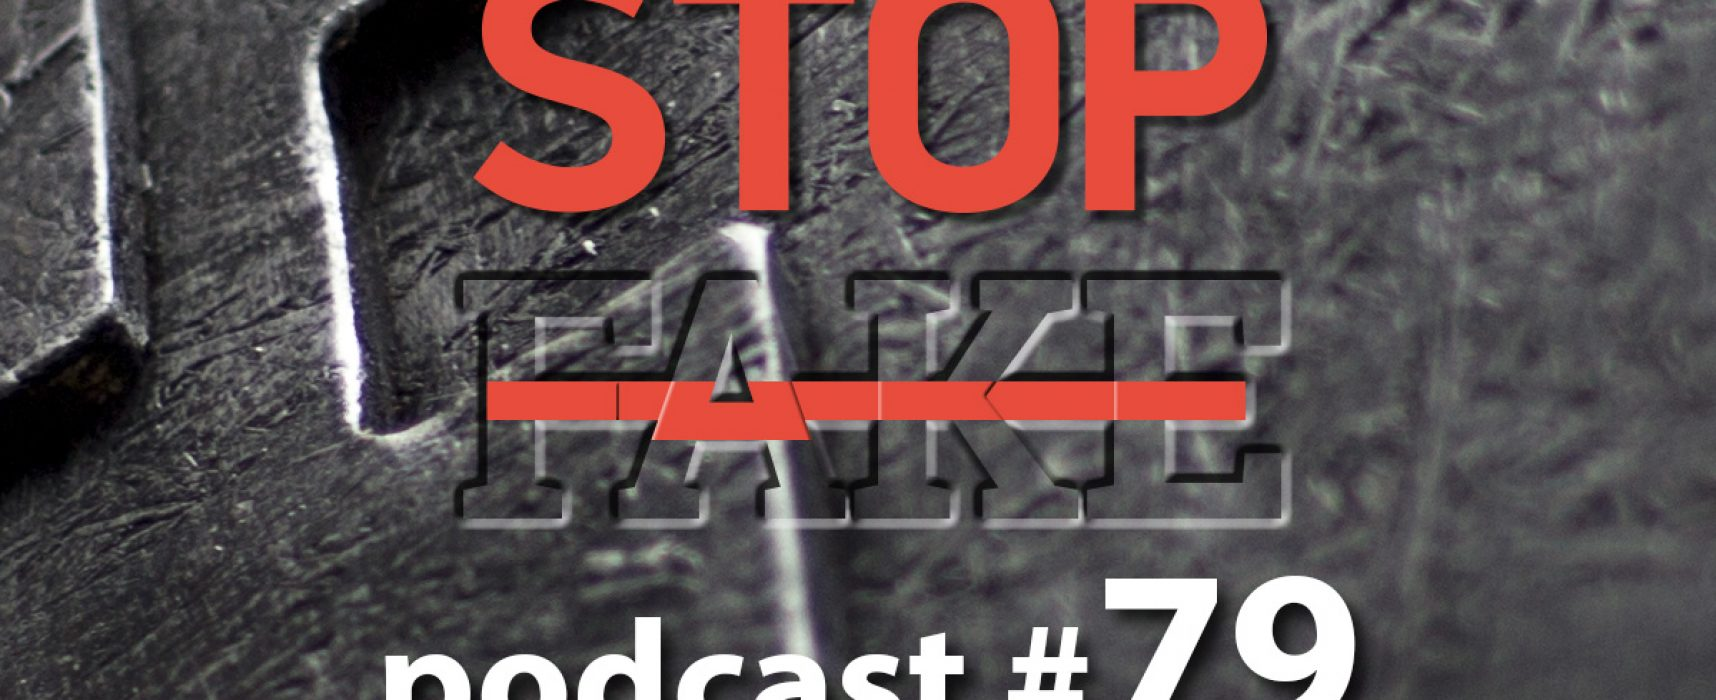 StopFake podcast #79